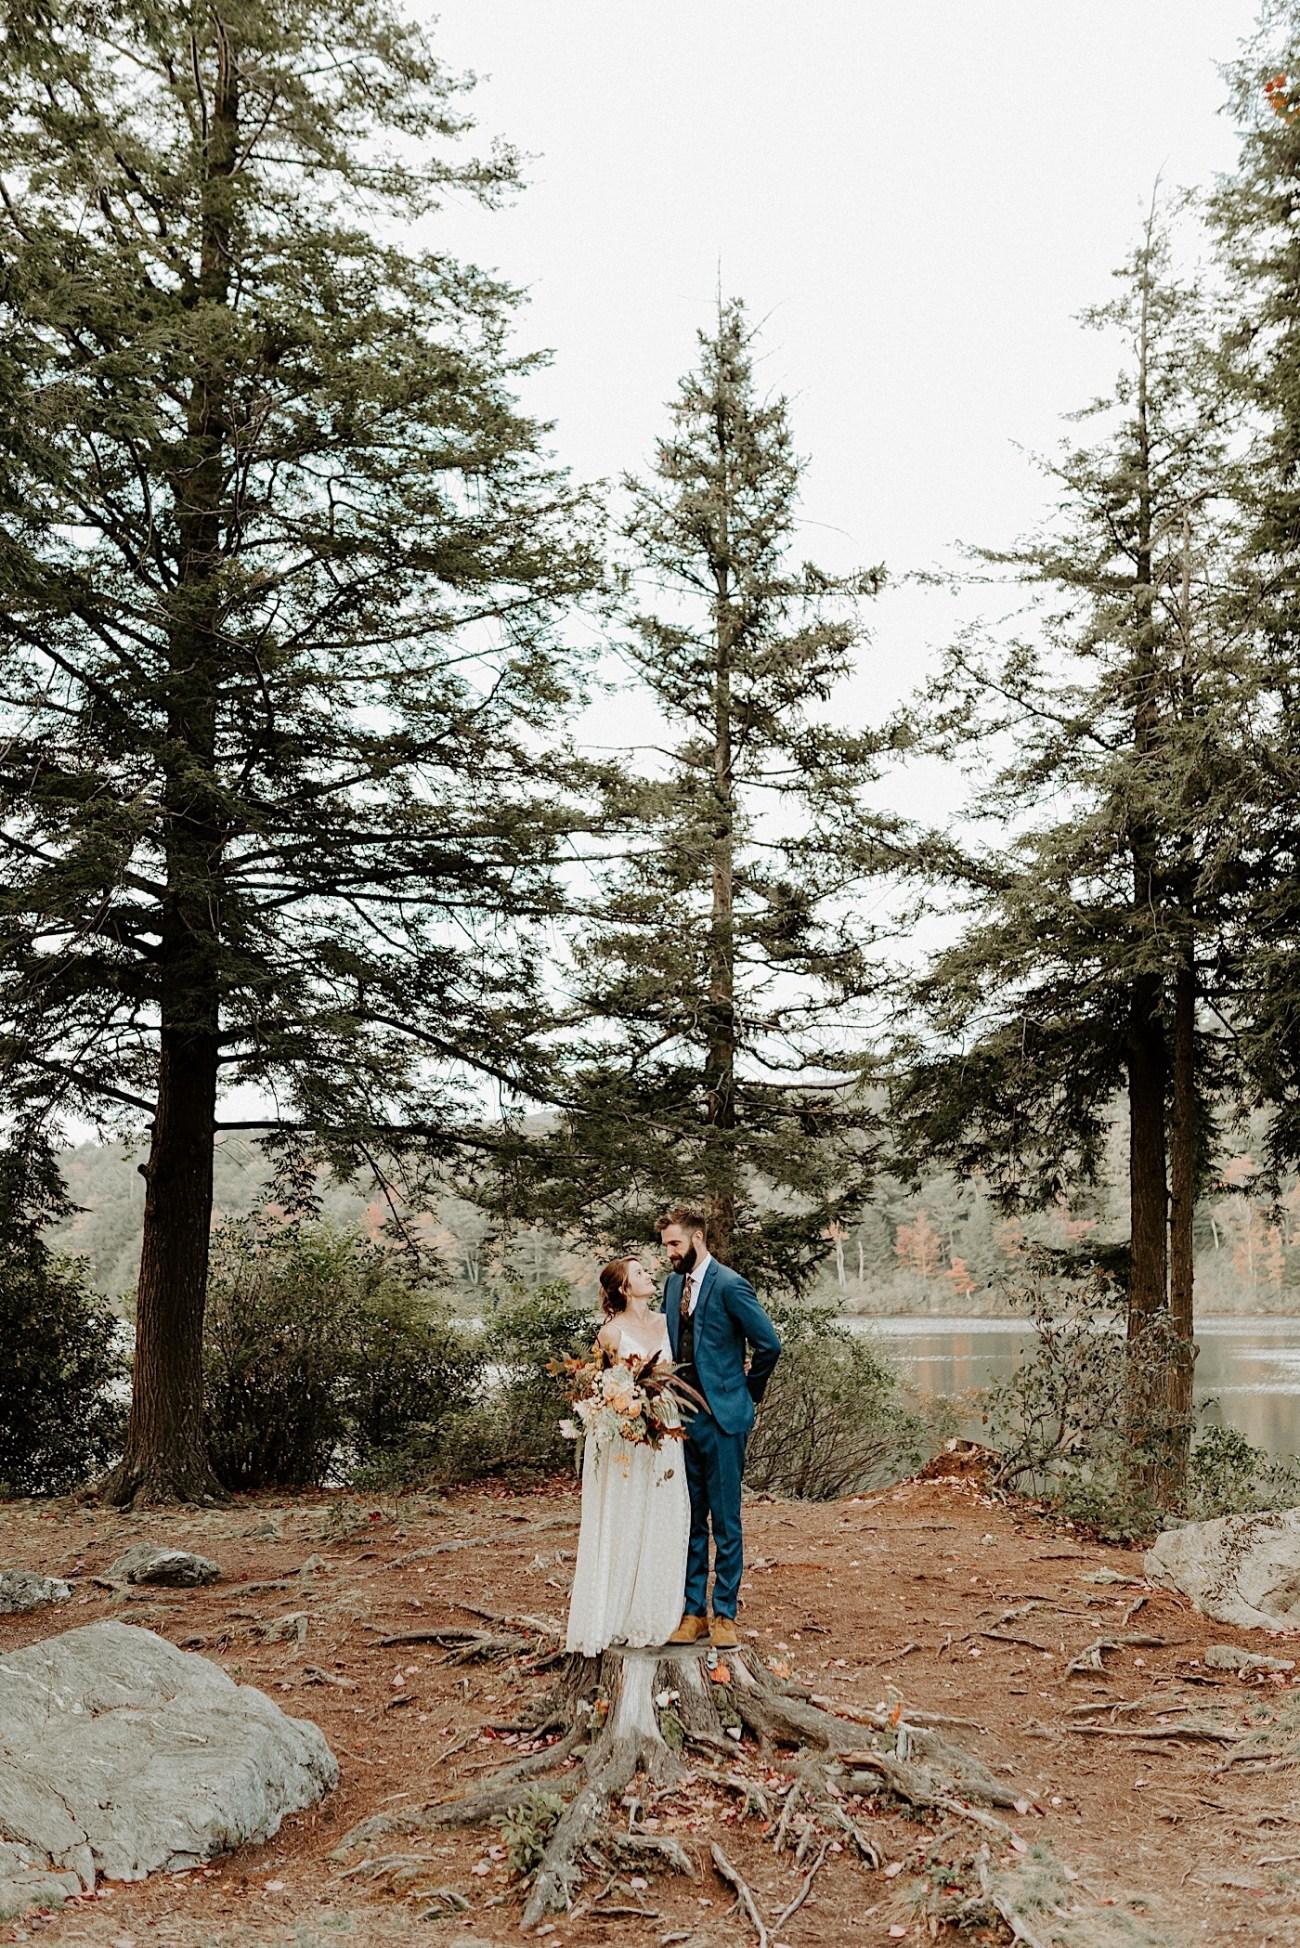 Massachusetts Wedding Photographer Boston Wedding Photographer Outdoor Mountain Wedding 070